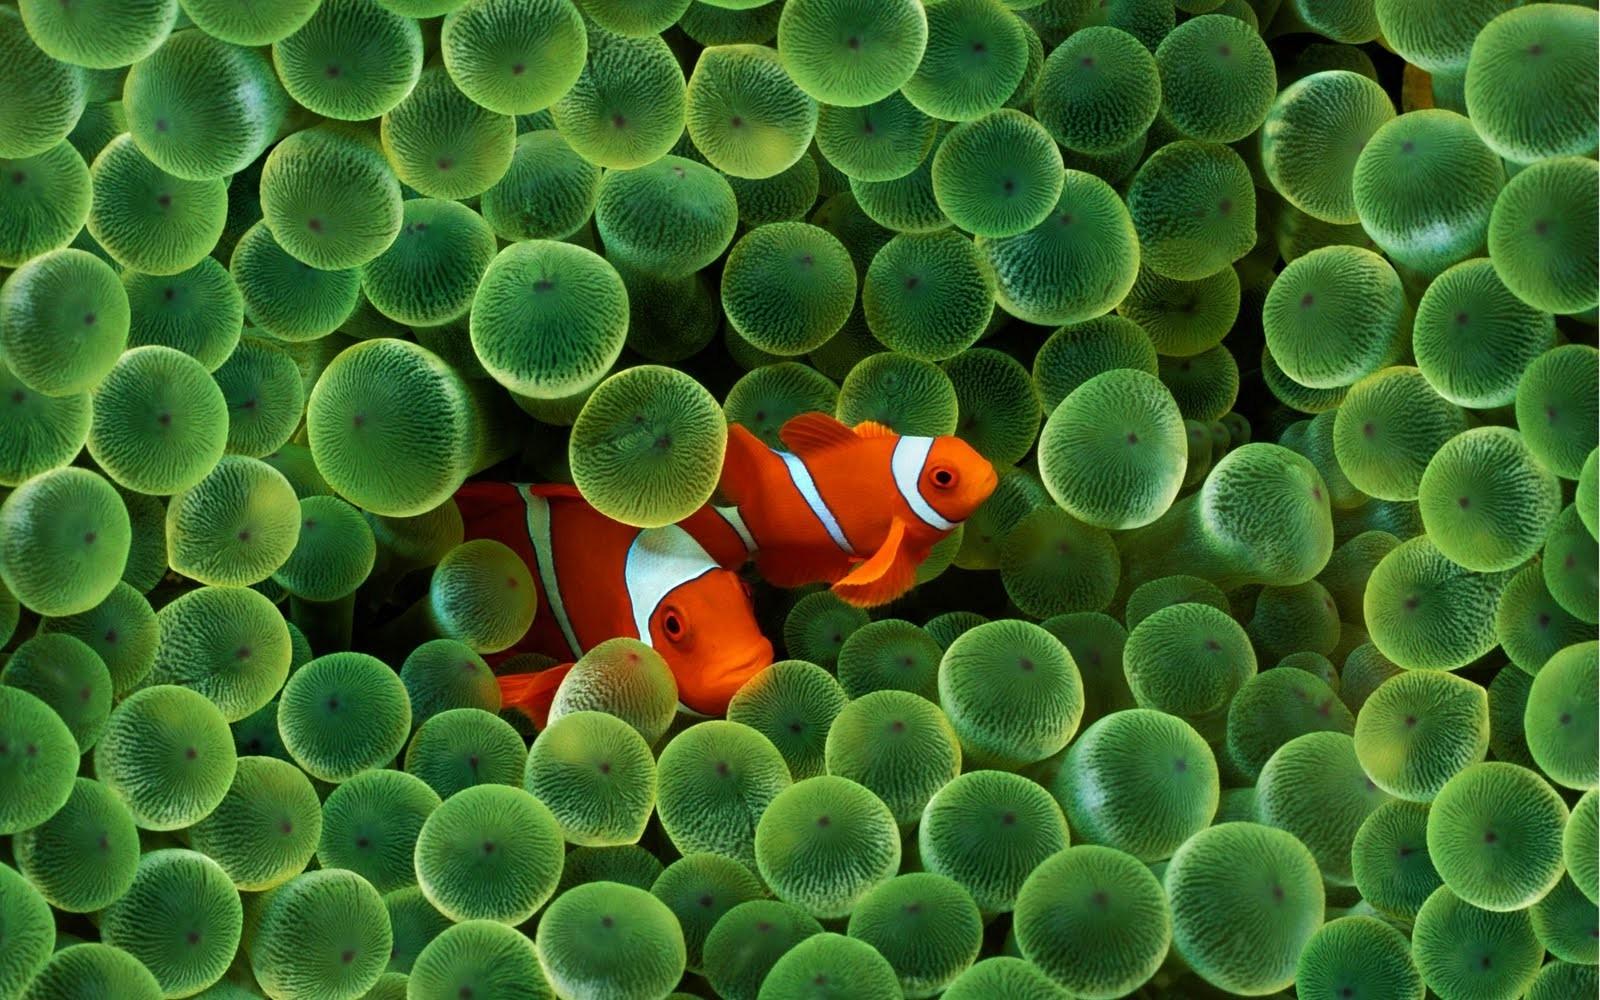 Apple Clownfish Wallpaper Iphone X Wallpaper Animals Water Underwater Iphone Coral Reef